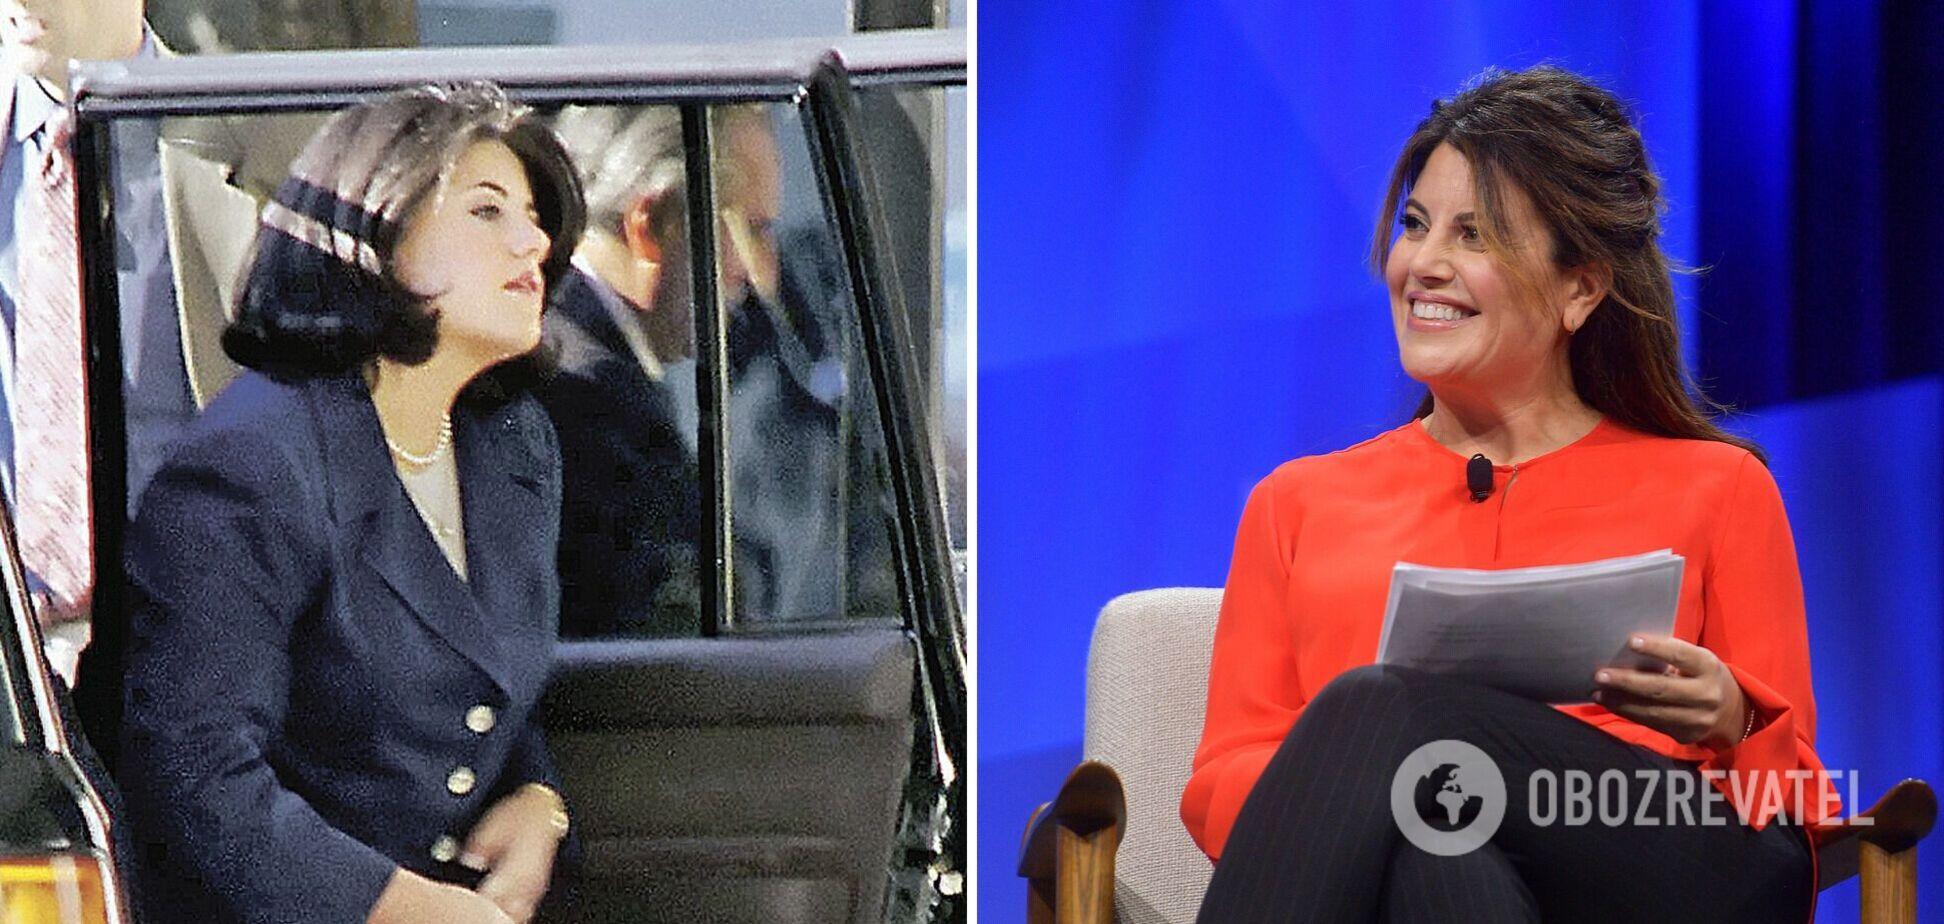 Монике Левински – 48: как сейчас выглядит любовница 42-го президента США